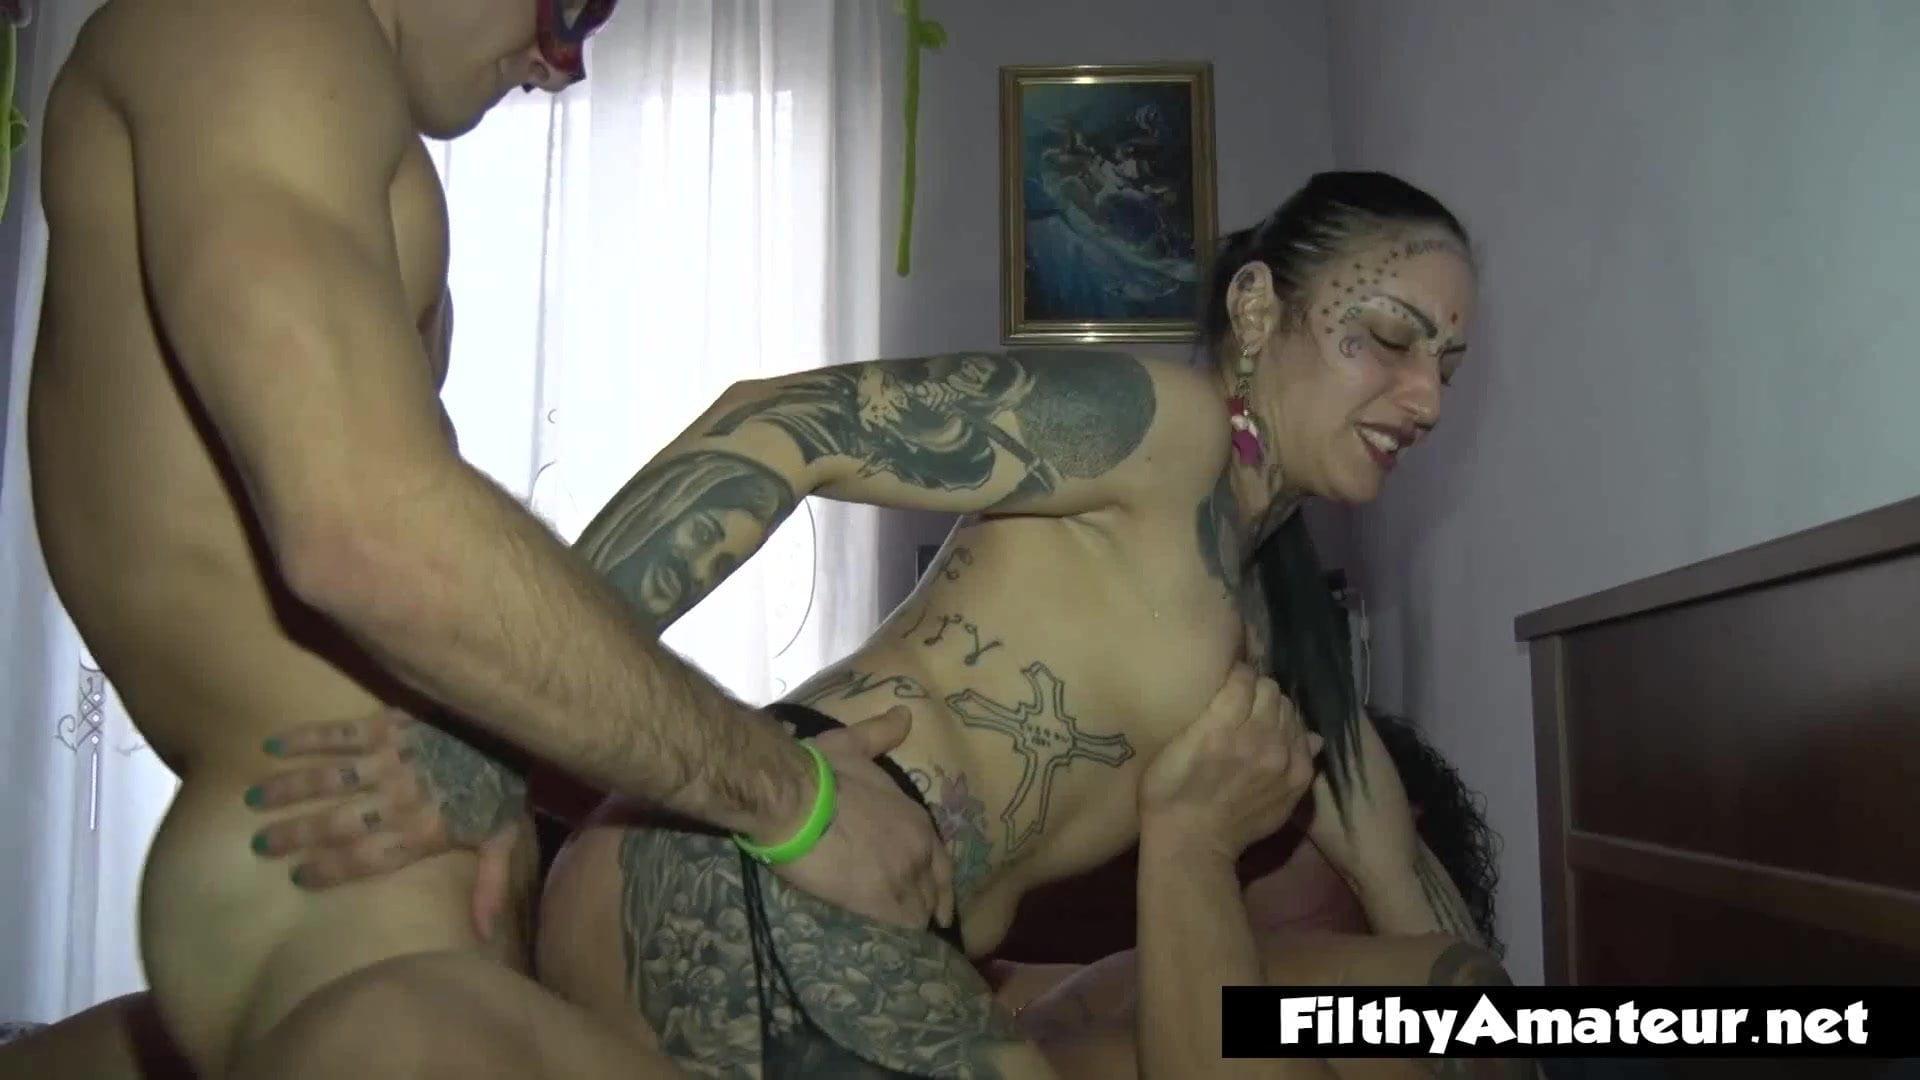 ???? 動画エロタレ savana styles rule 34 futa  ? XXX Free Porn Video WebCam sex! ????